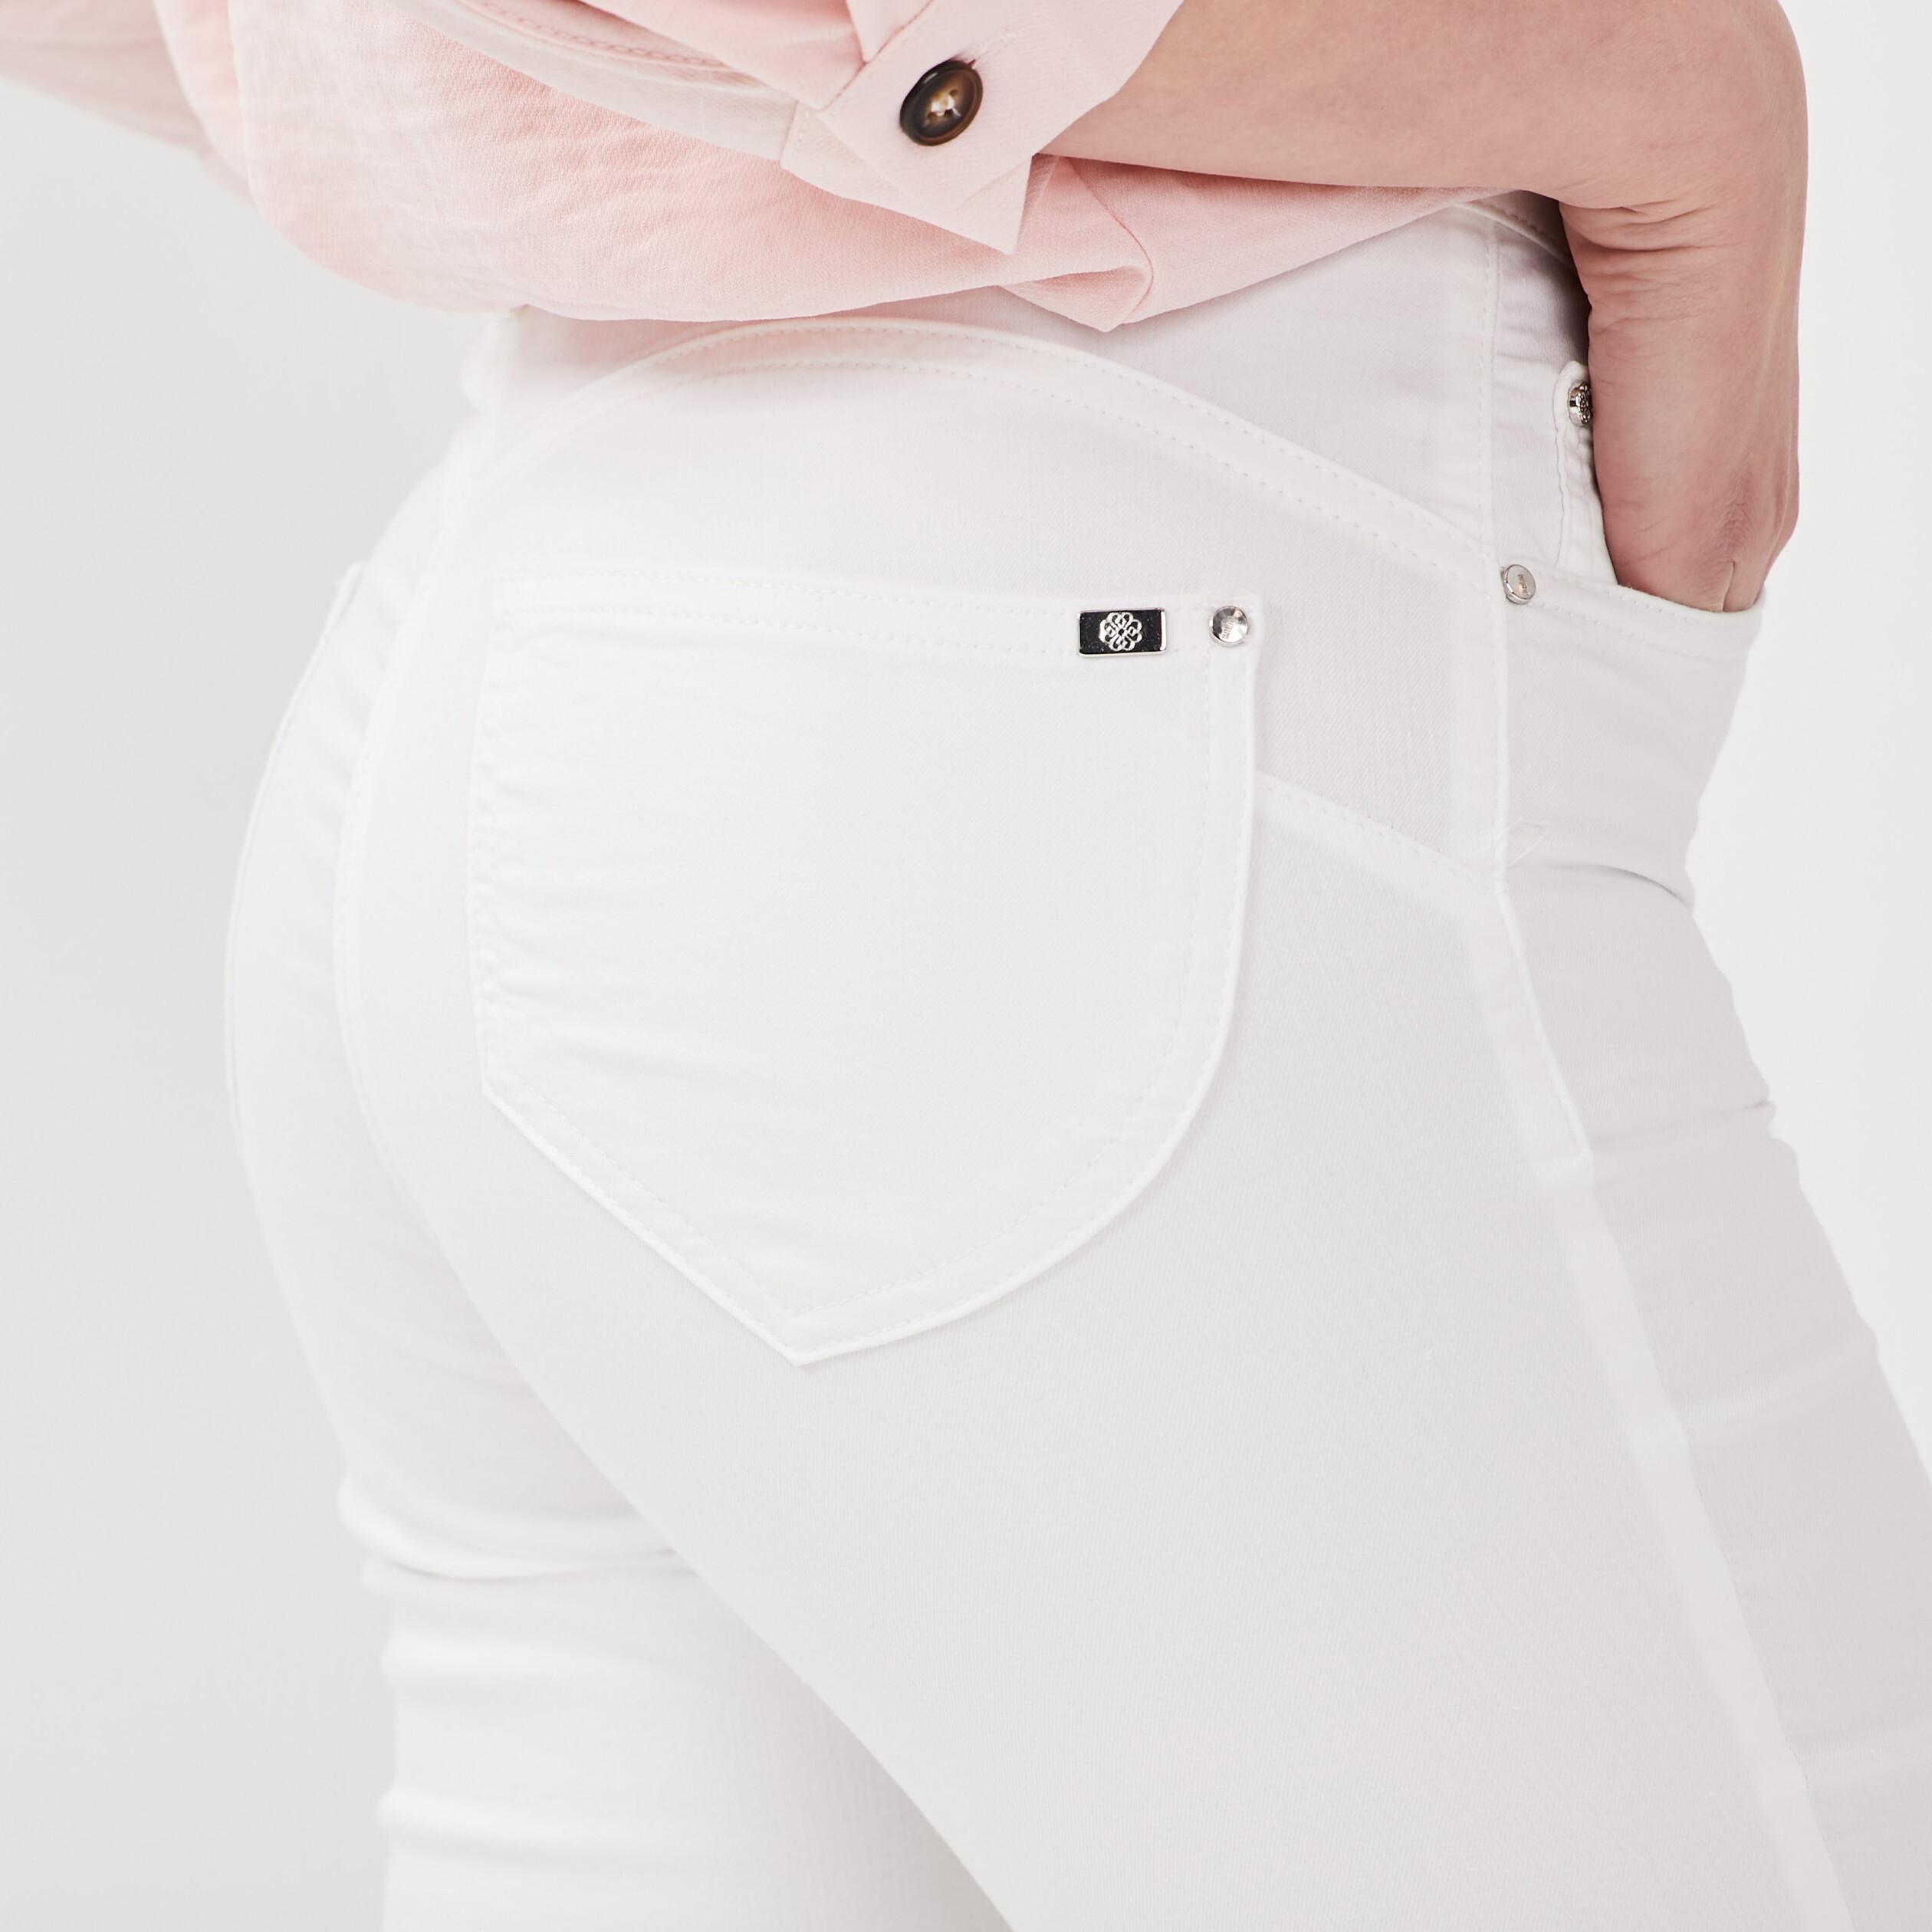 Blanc Toucher Femme Léger Pantalon Doux nkO0wP